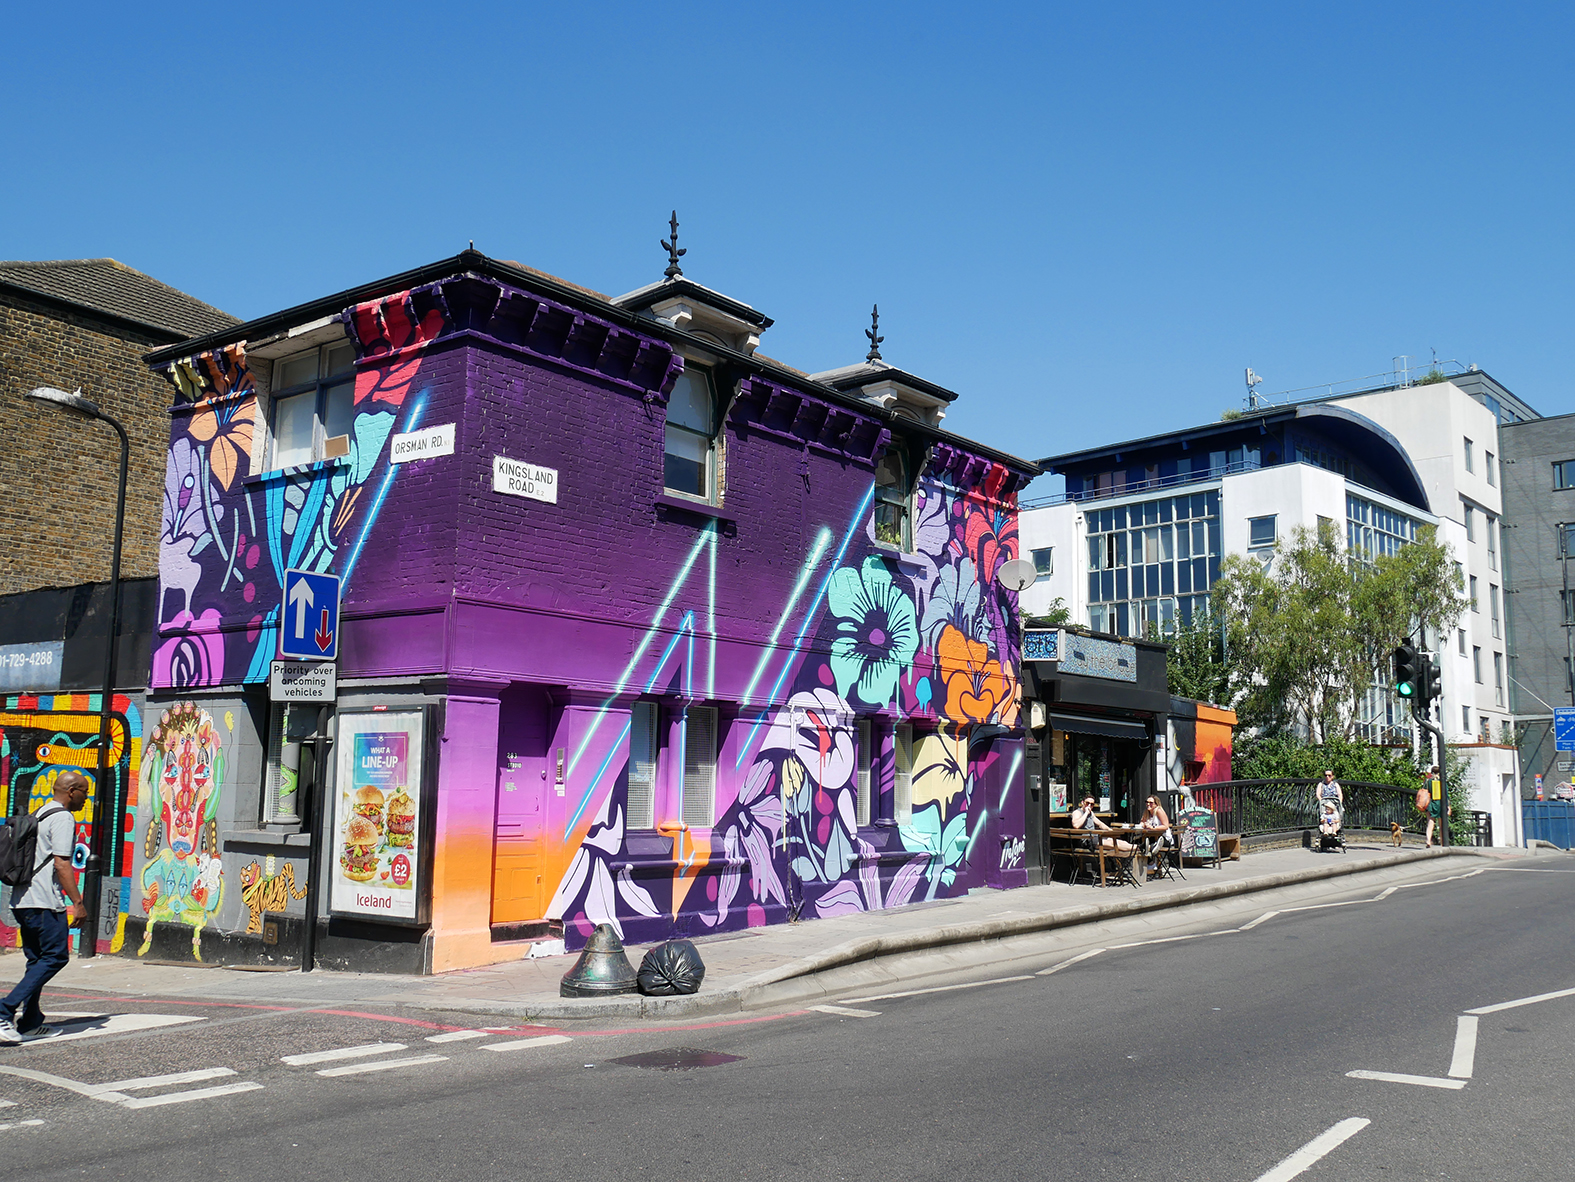 Nerone-olly-gallery-street-art-8